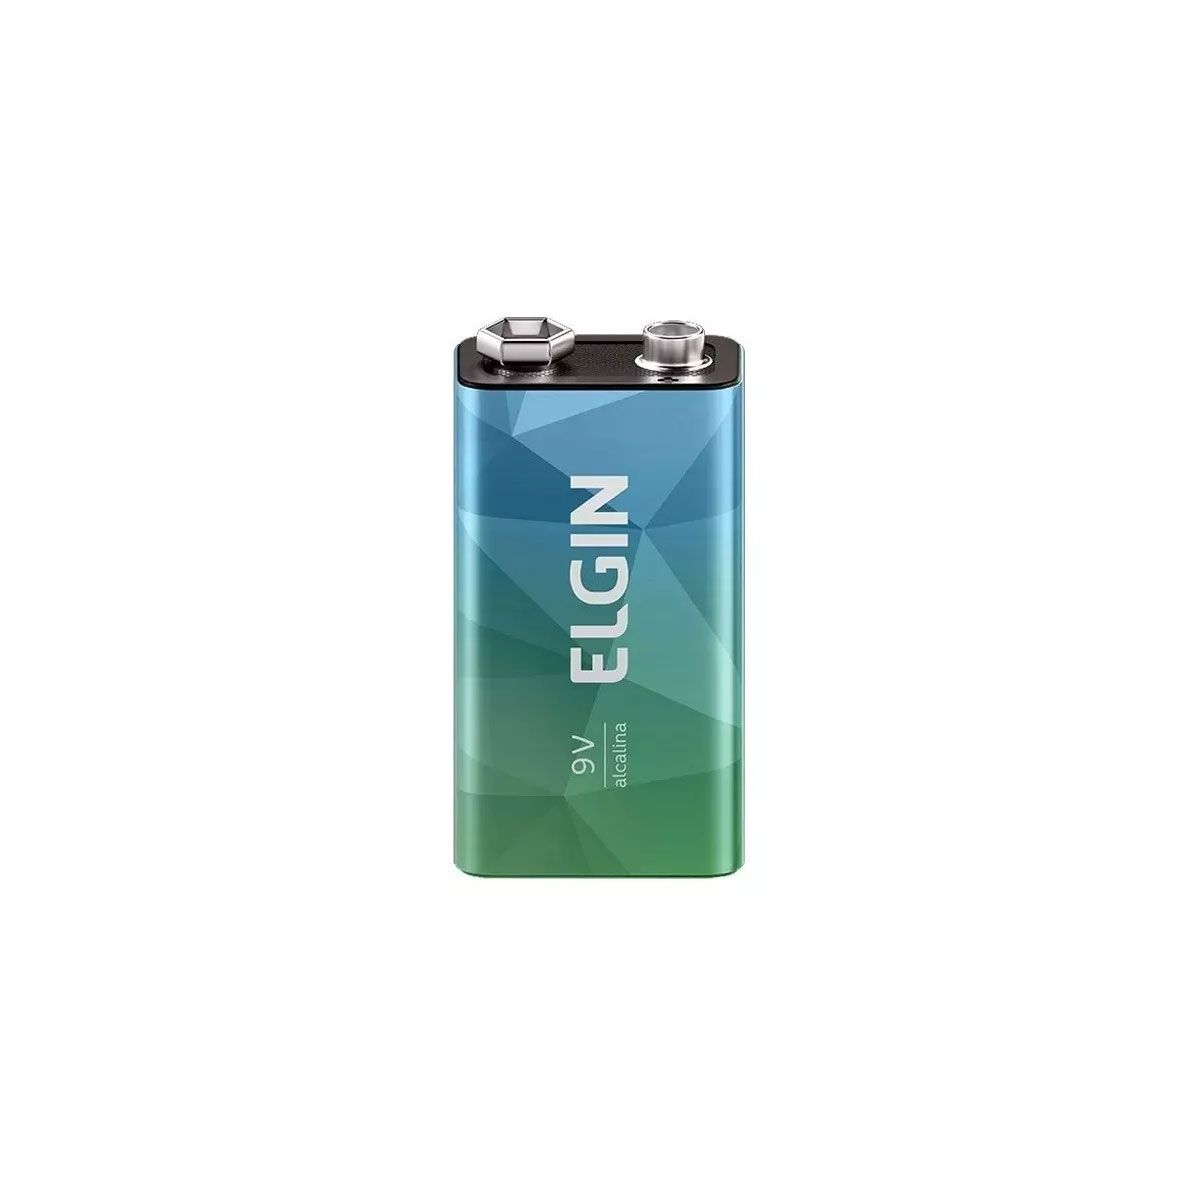 Bateria 9v Alcalina - Elgin